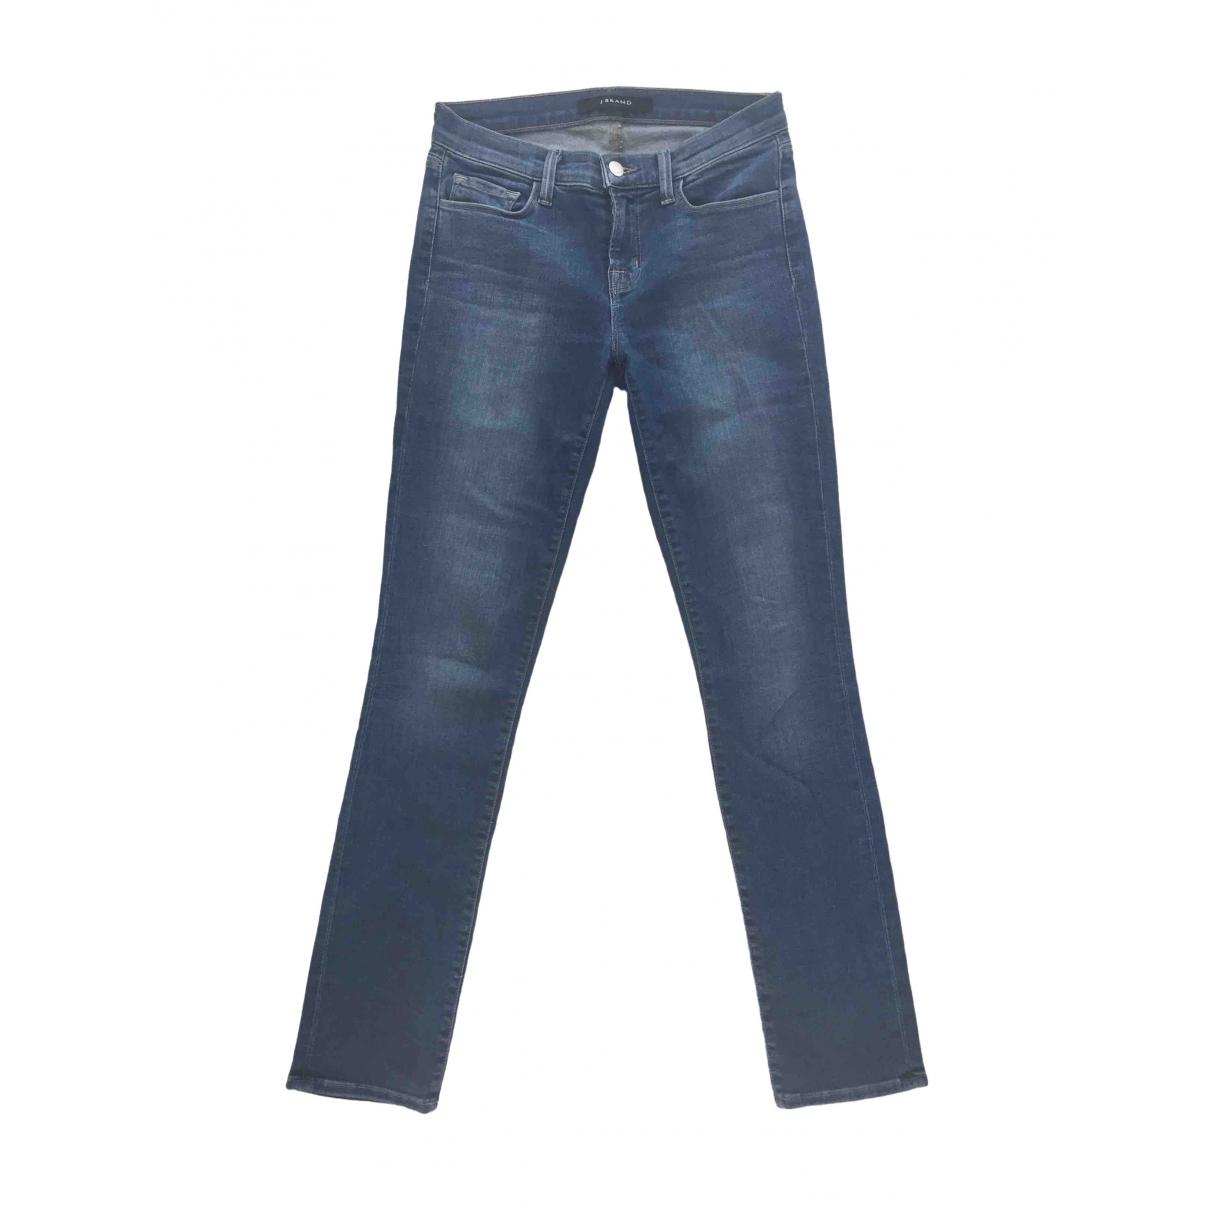 J Brand \N Blue Denim - Jeans Jeans for Women 26 US